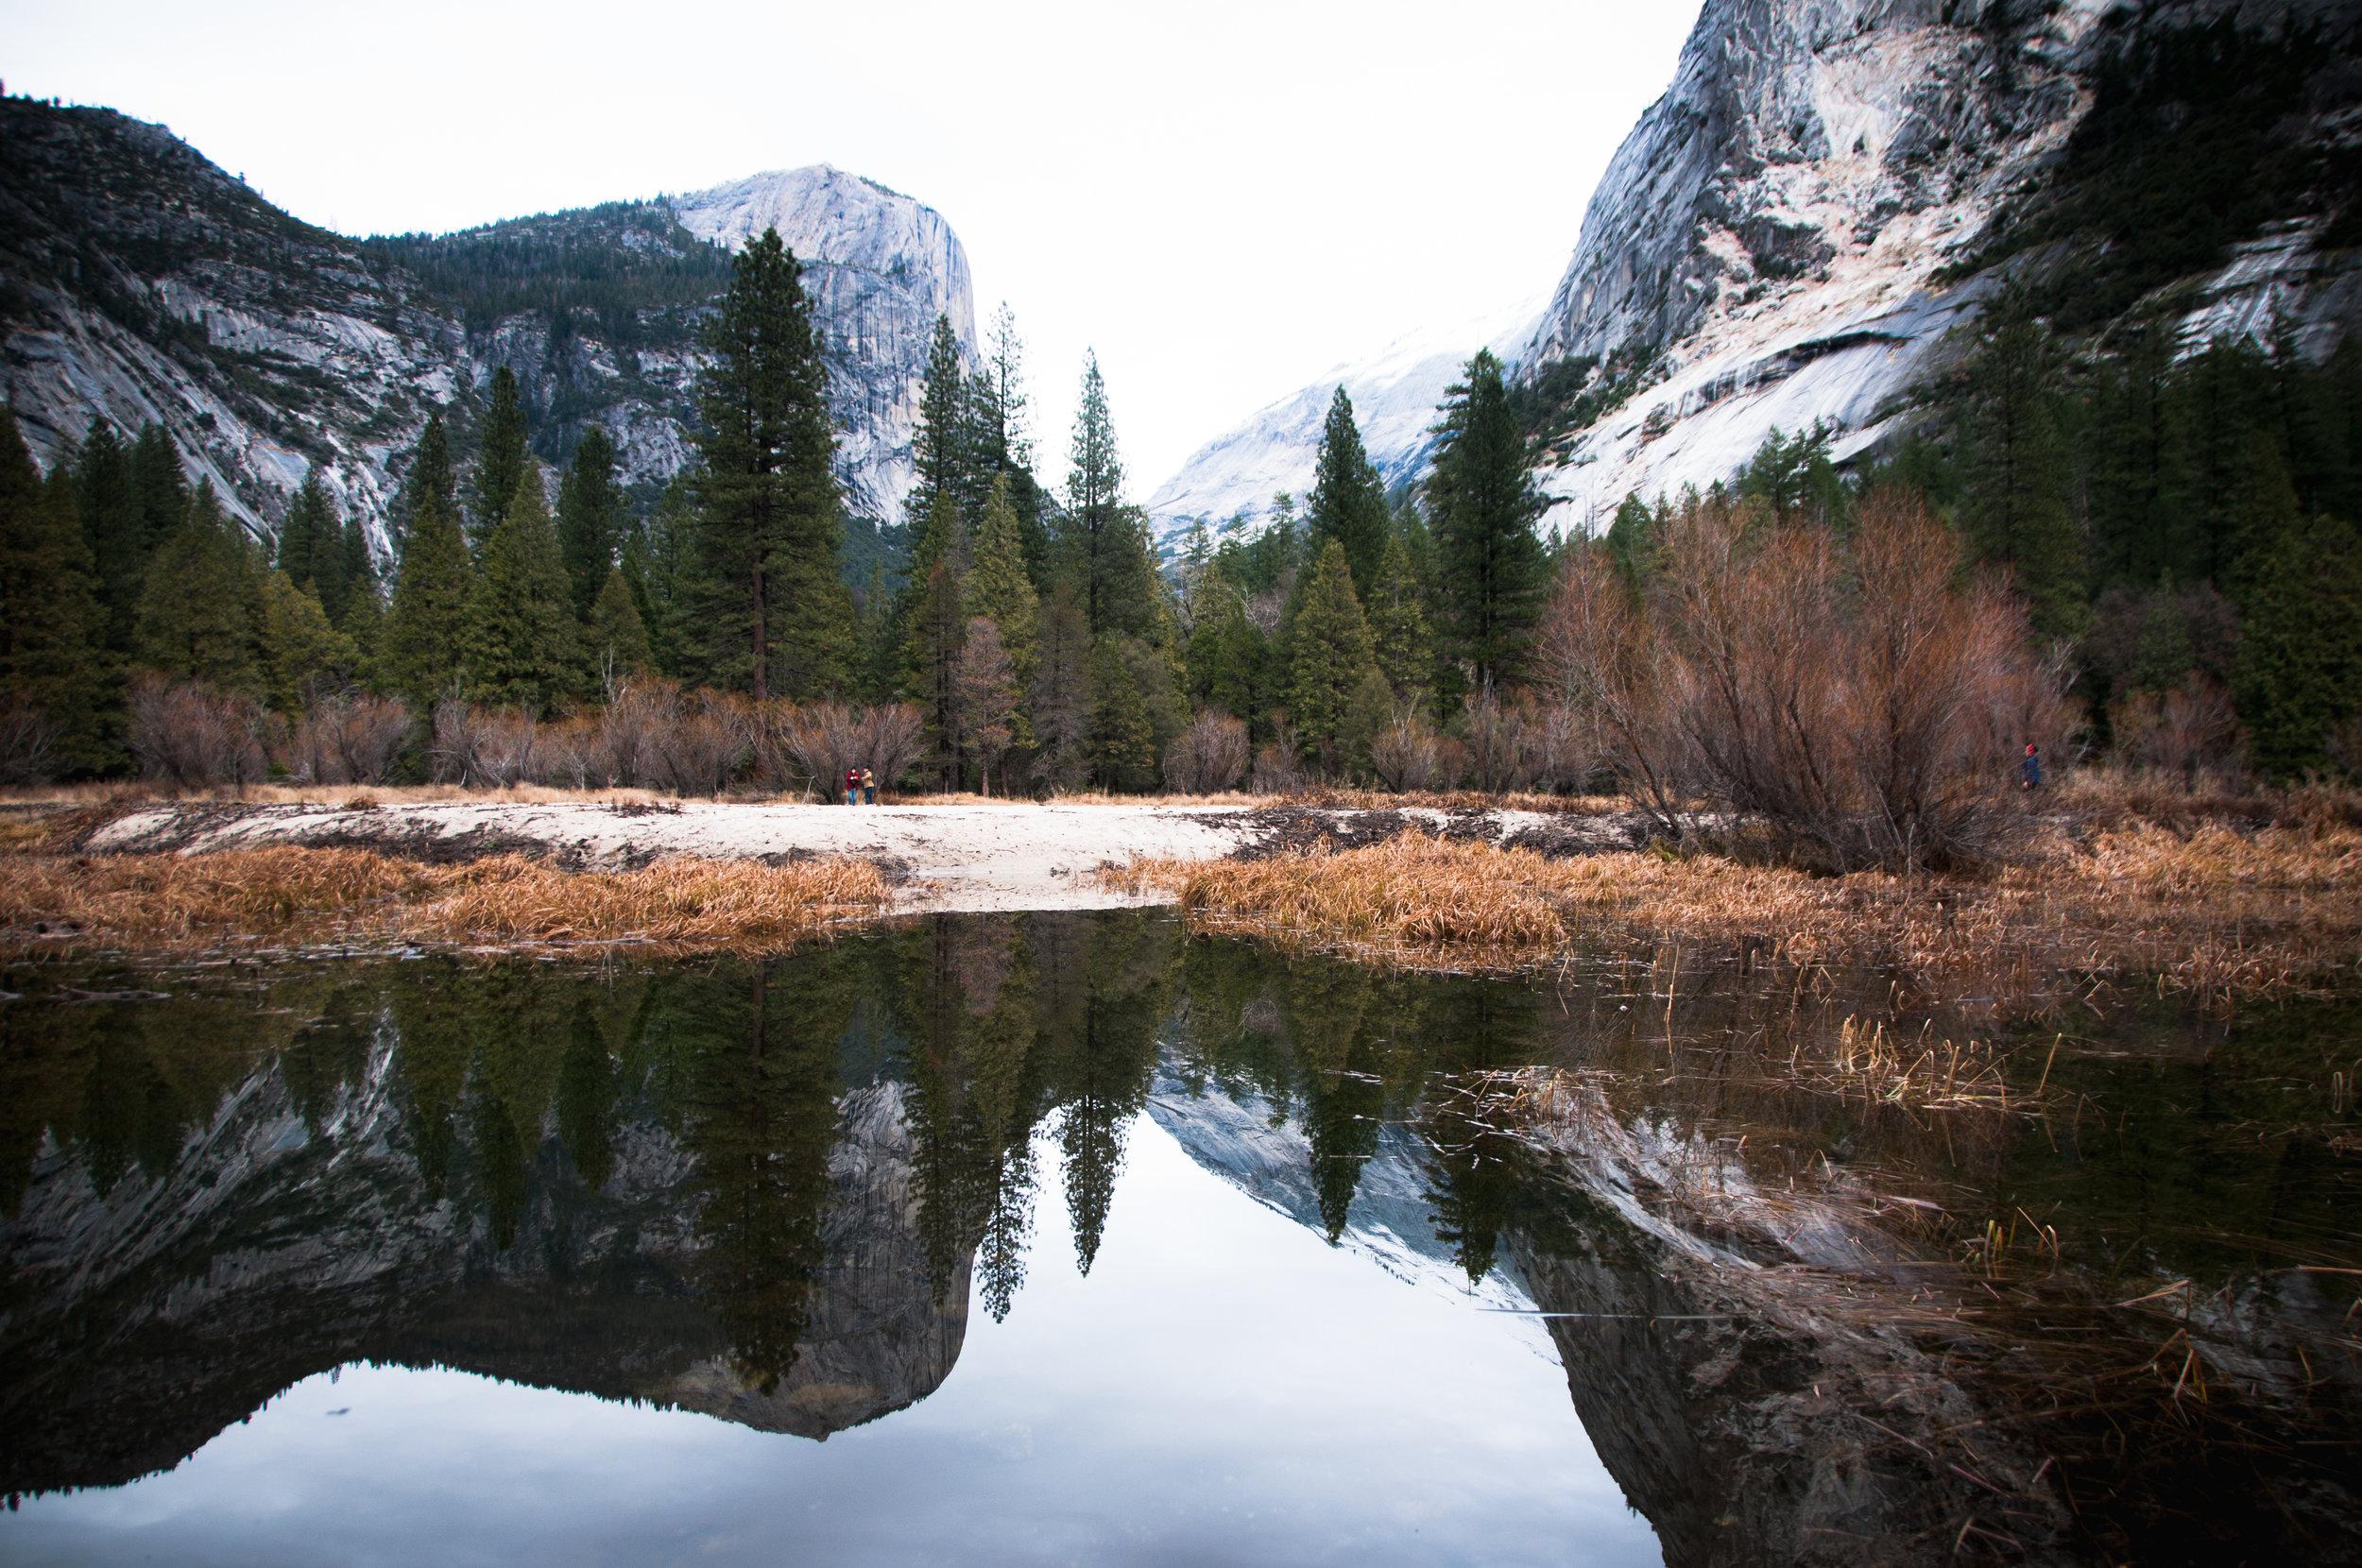 20180111-YosemiteTrip_KCFedere-2373.jpg